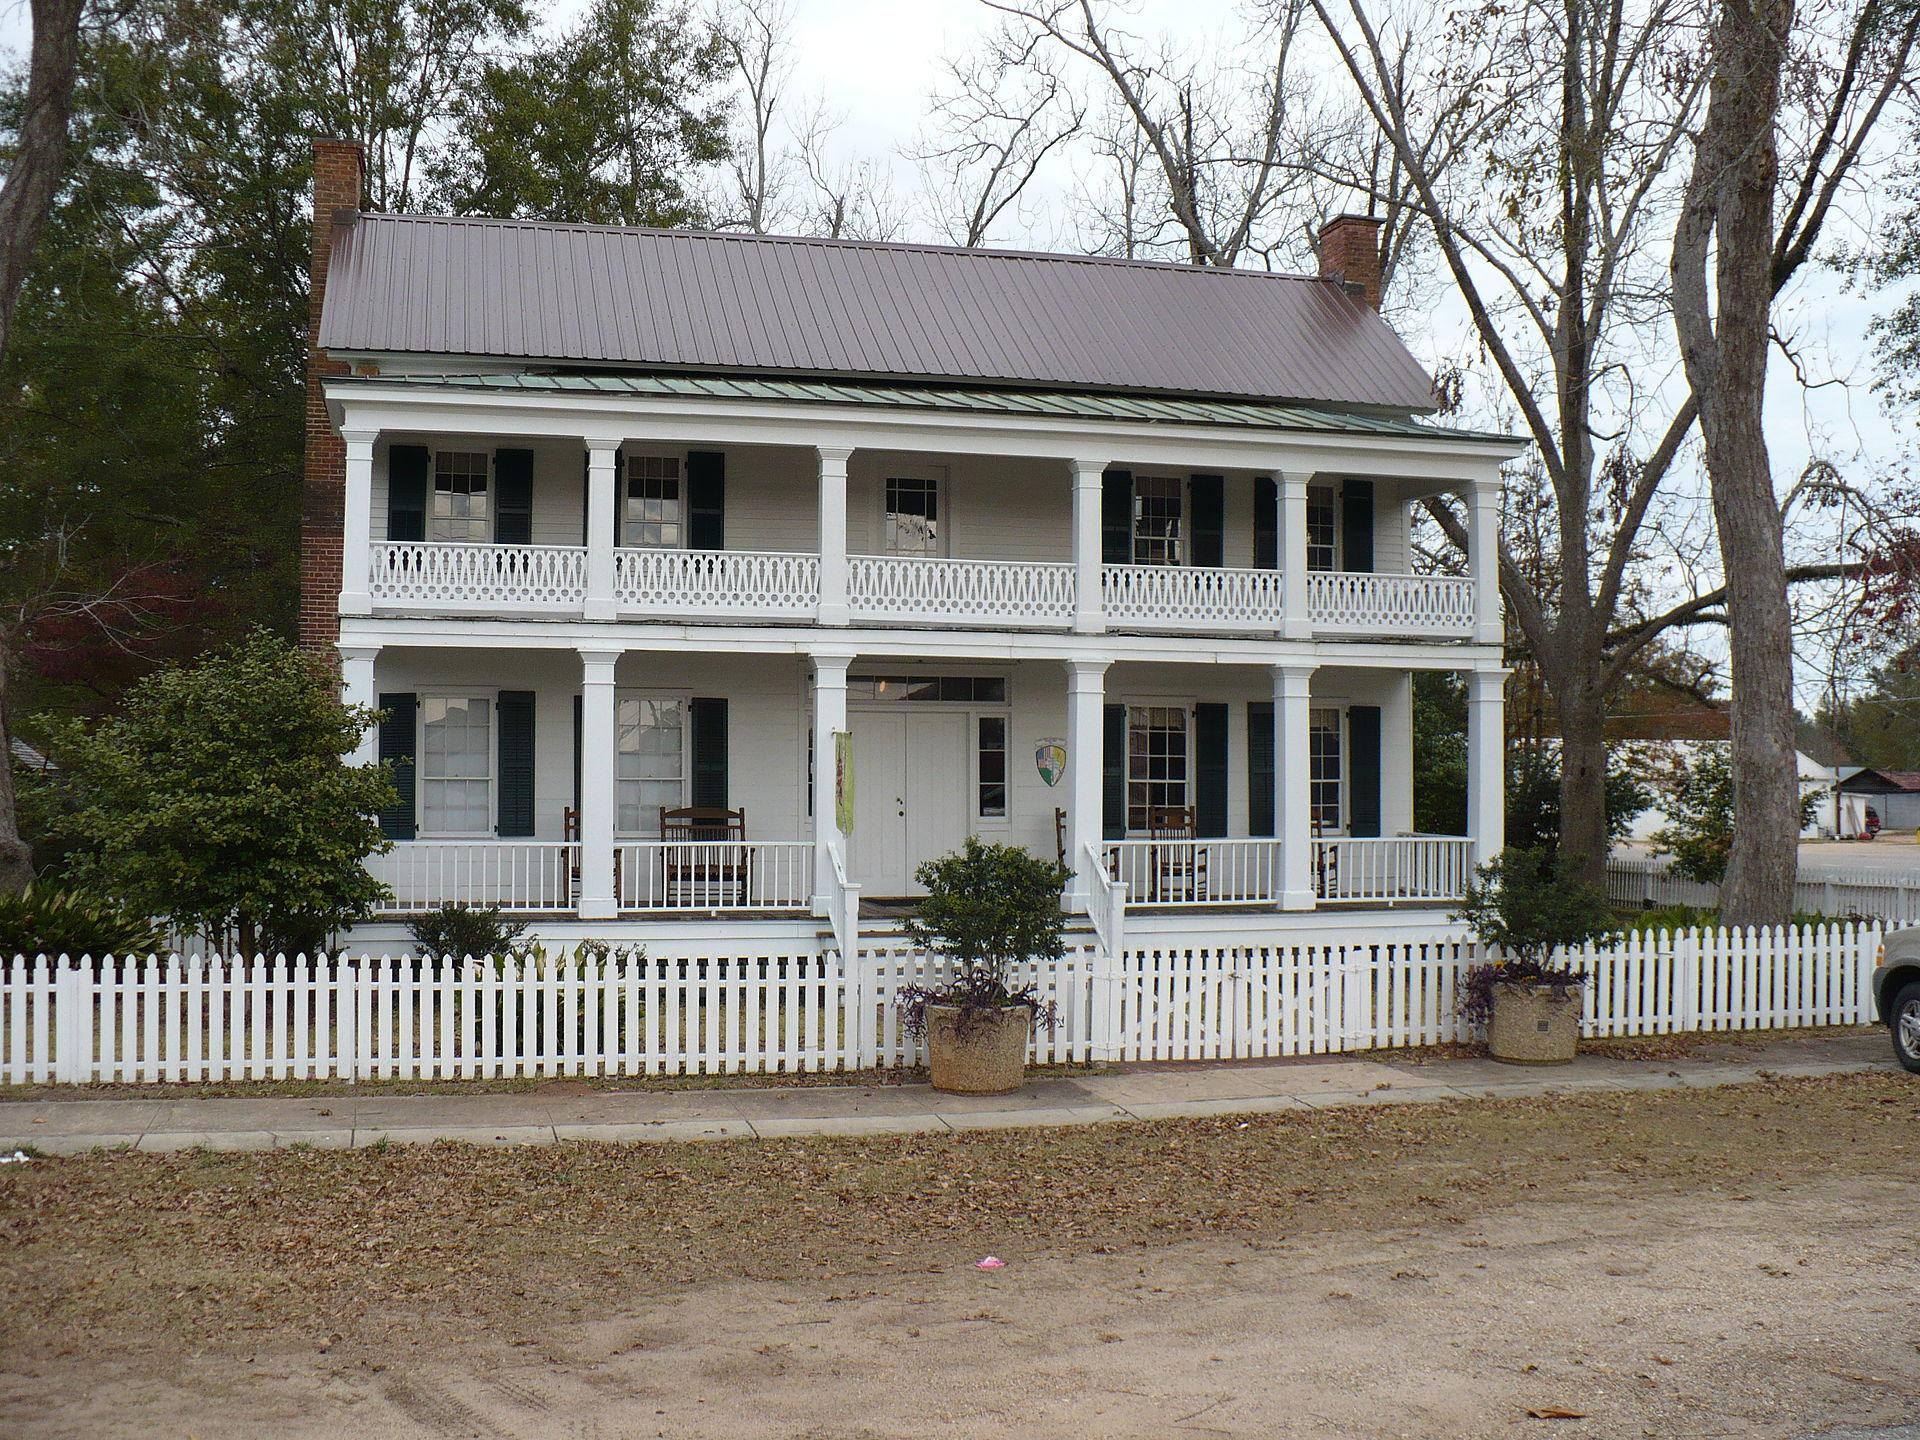 The Alston-Cobb House